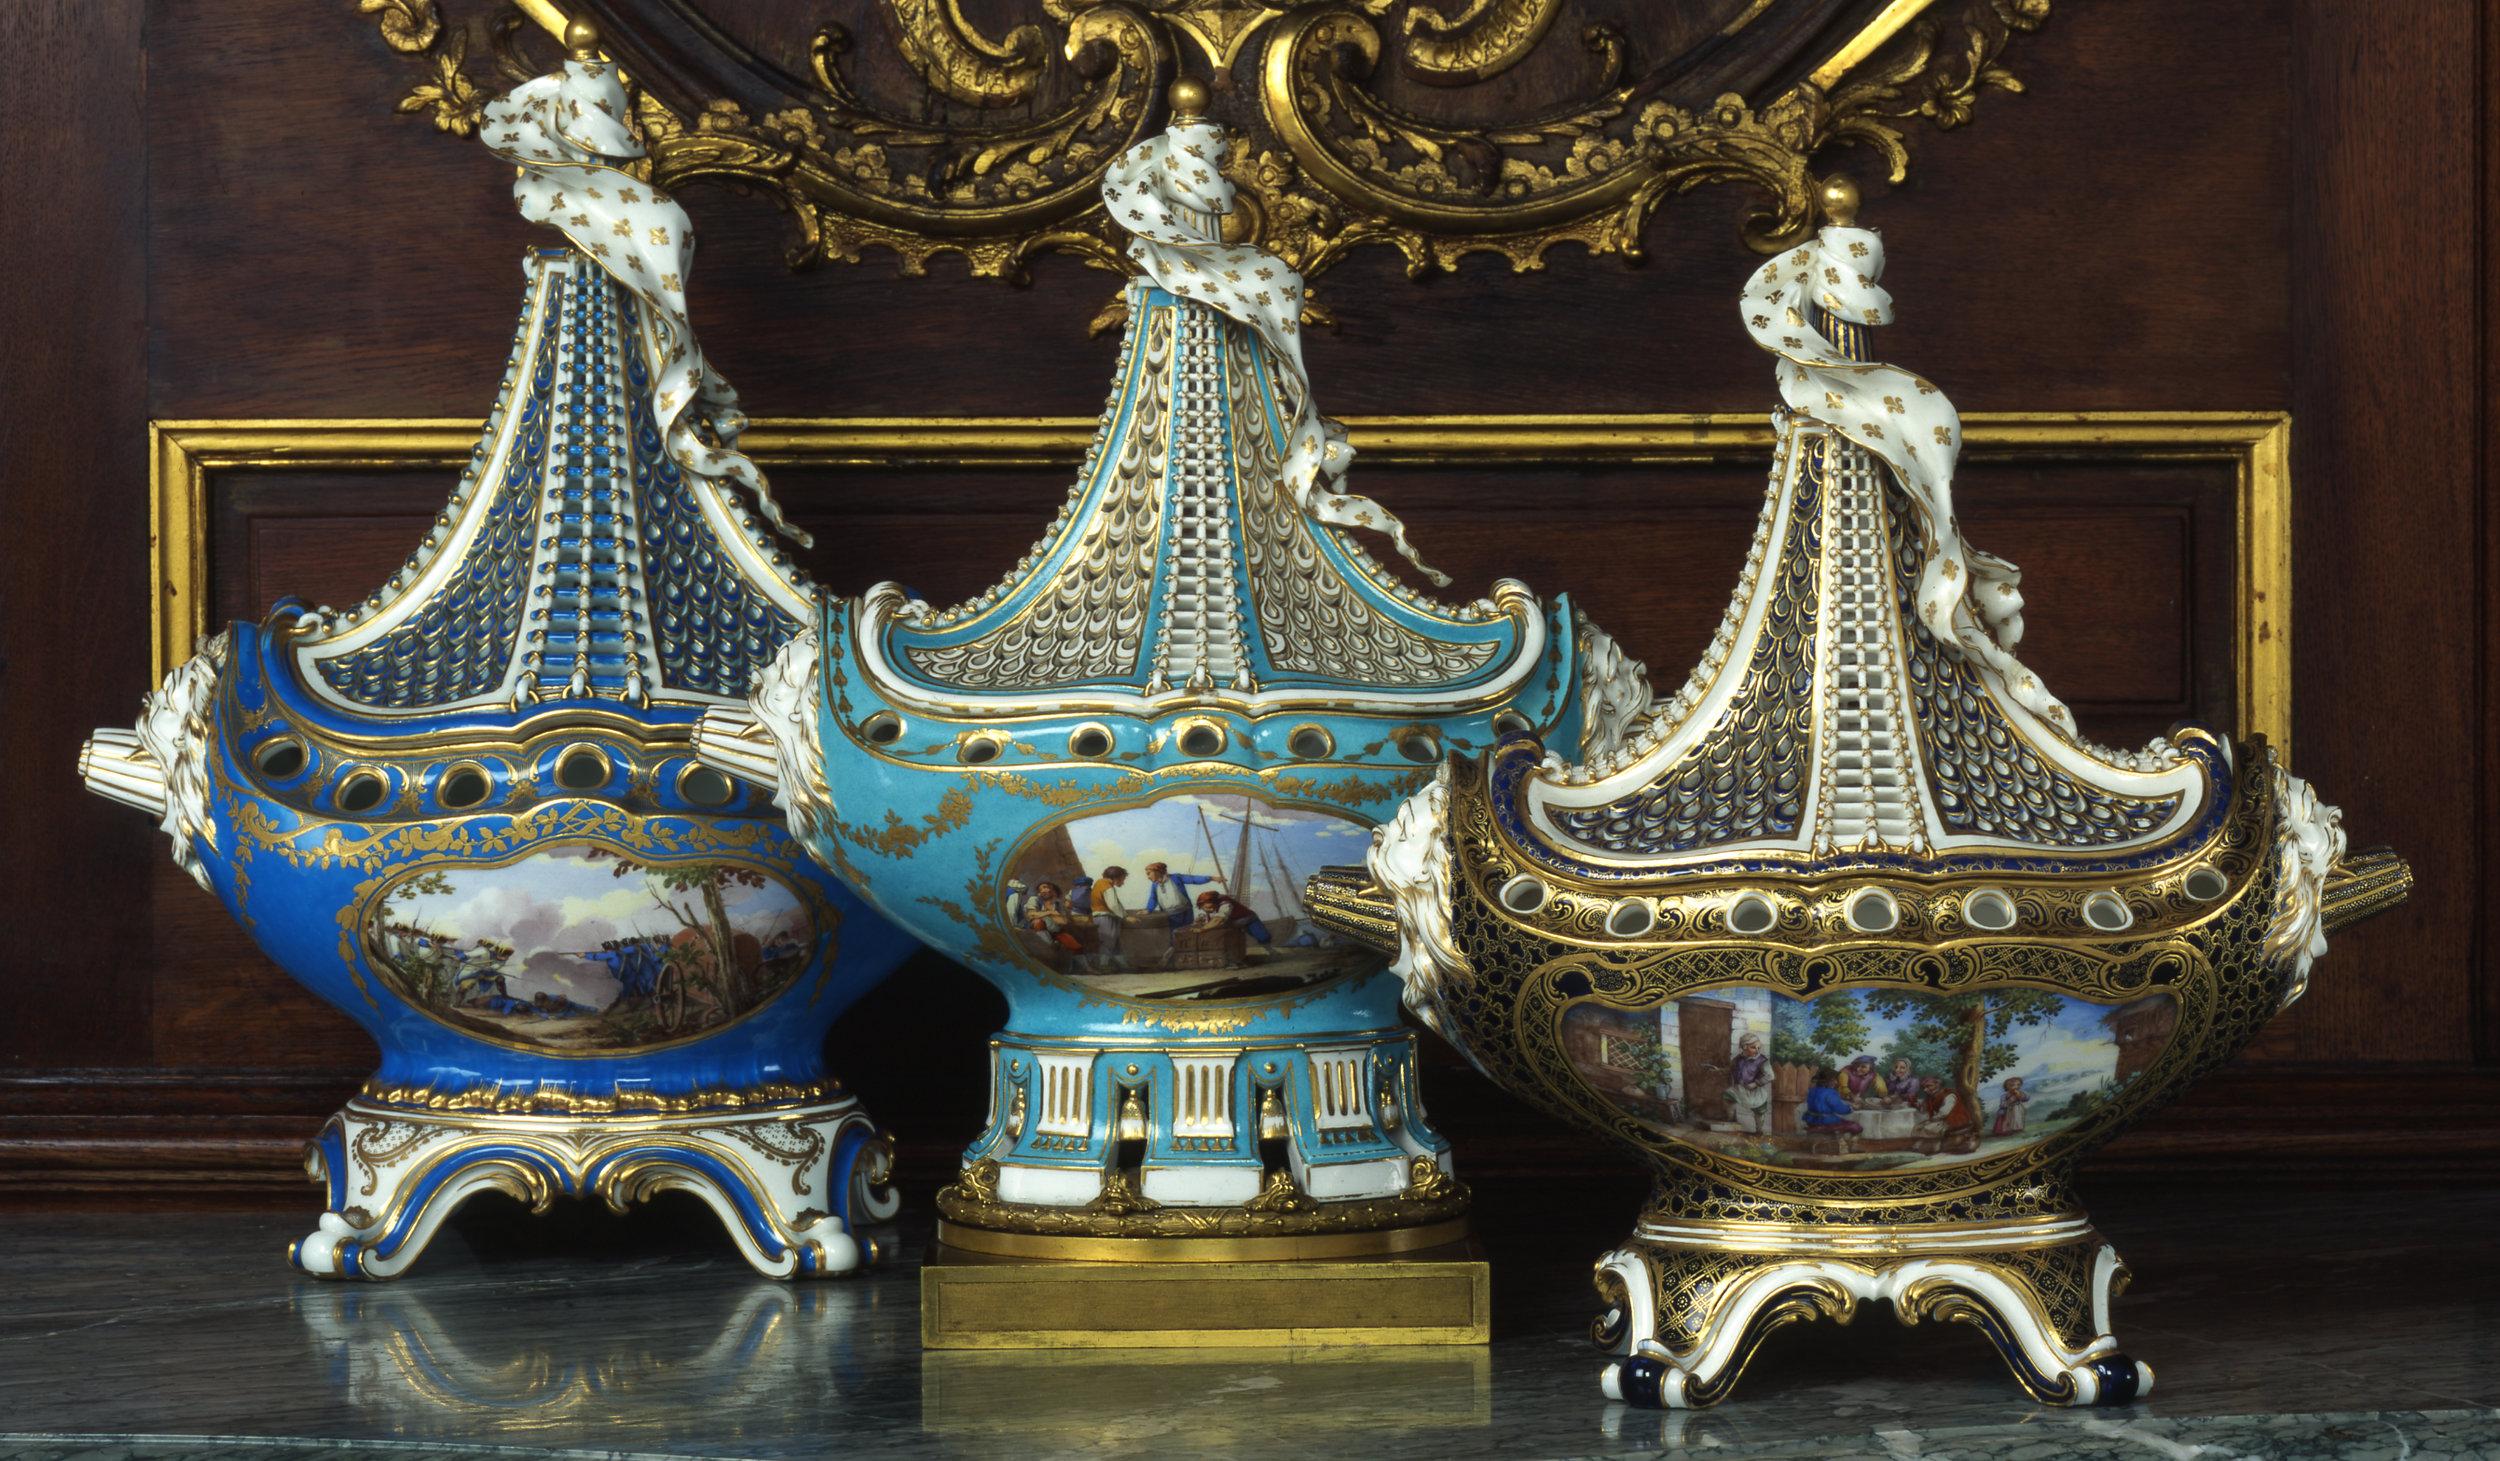 Sèvres_porcelain_manufactory,_Pot-pourri_vases,_1761_at_Waddesdon_Manor_(cropped).jpg